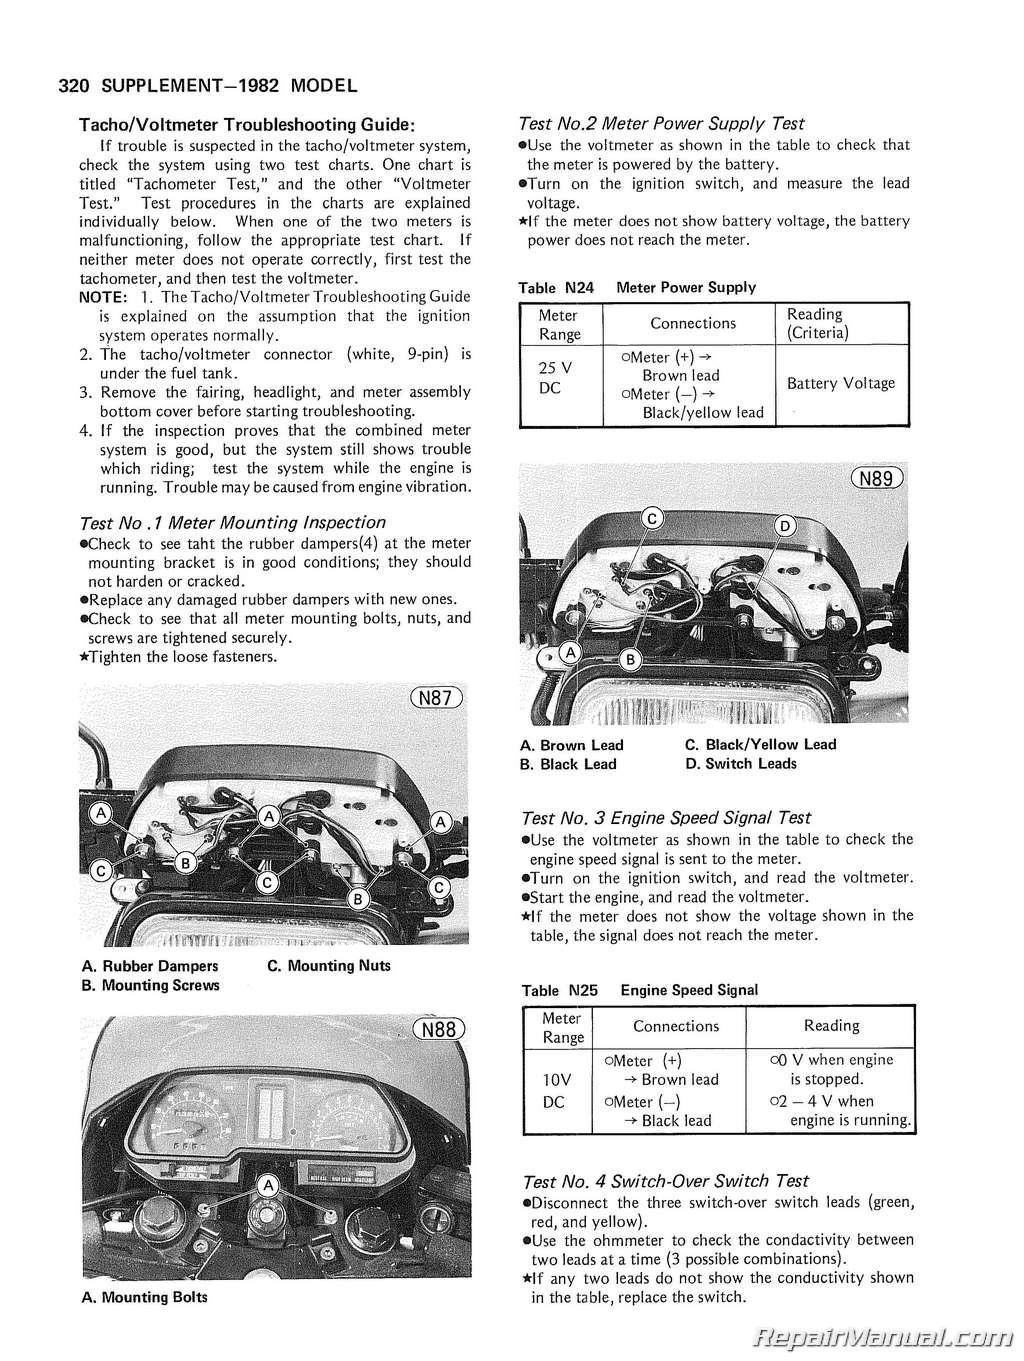 Kz750 Four Wiring Diagram 1983 Kawasaki Diagrams 1980 Motorcycle Service Manual Basic